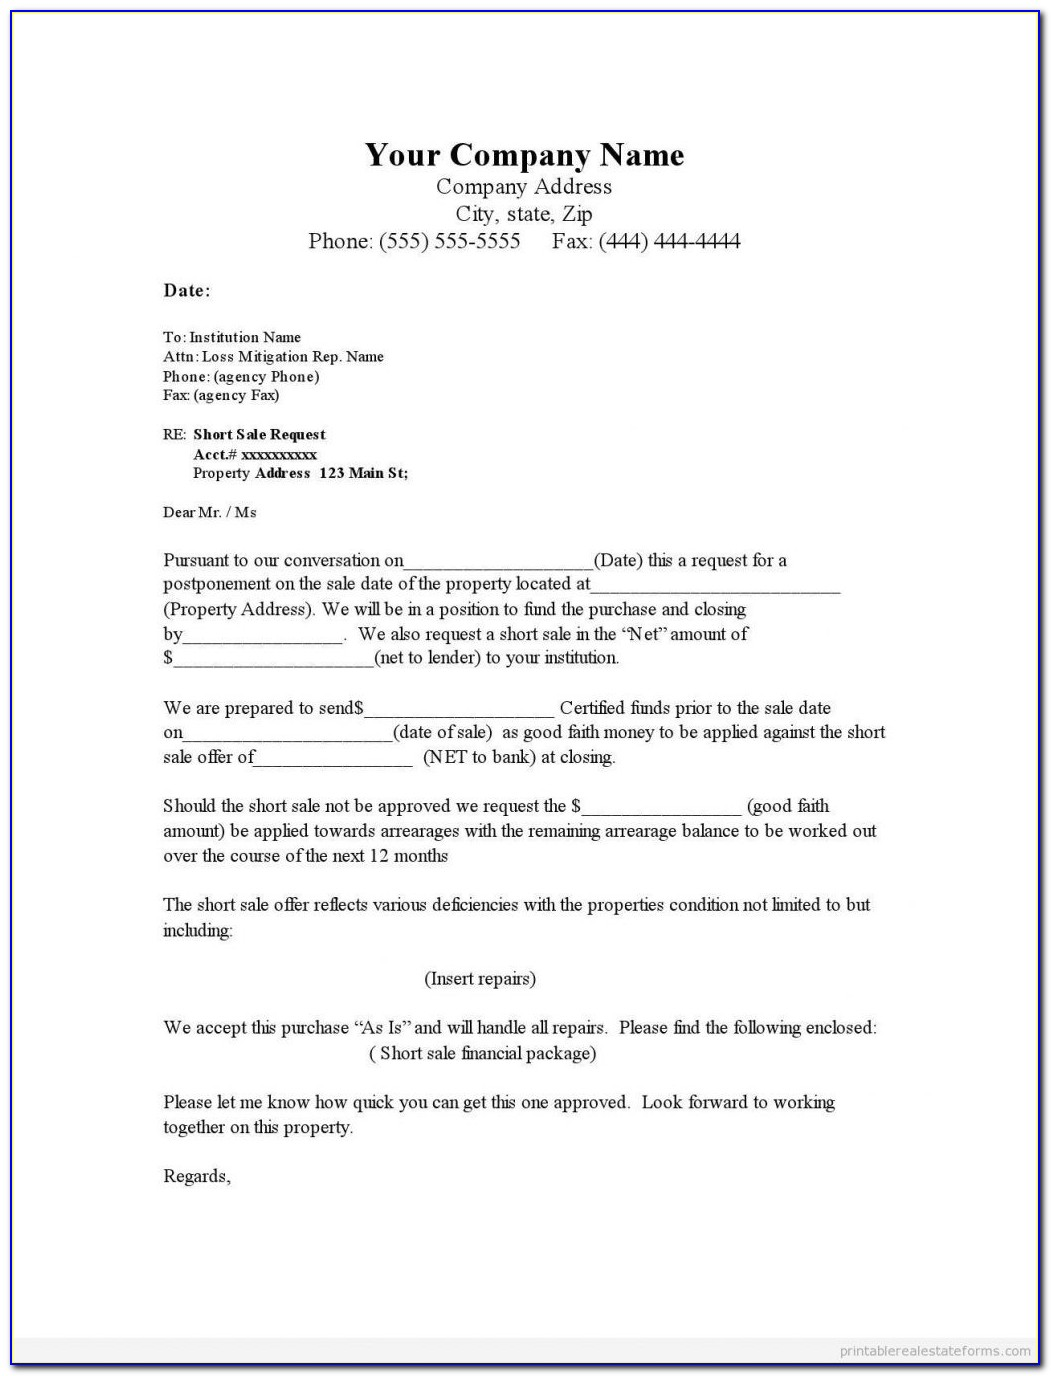 Lien Holder Release Form Oklahoma